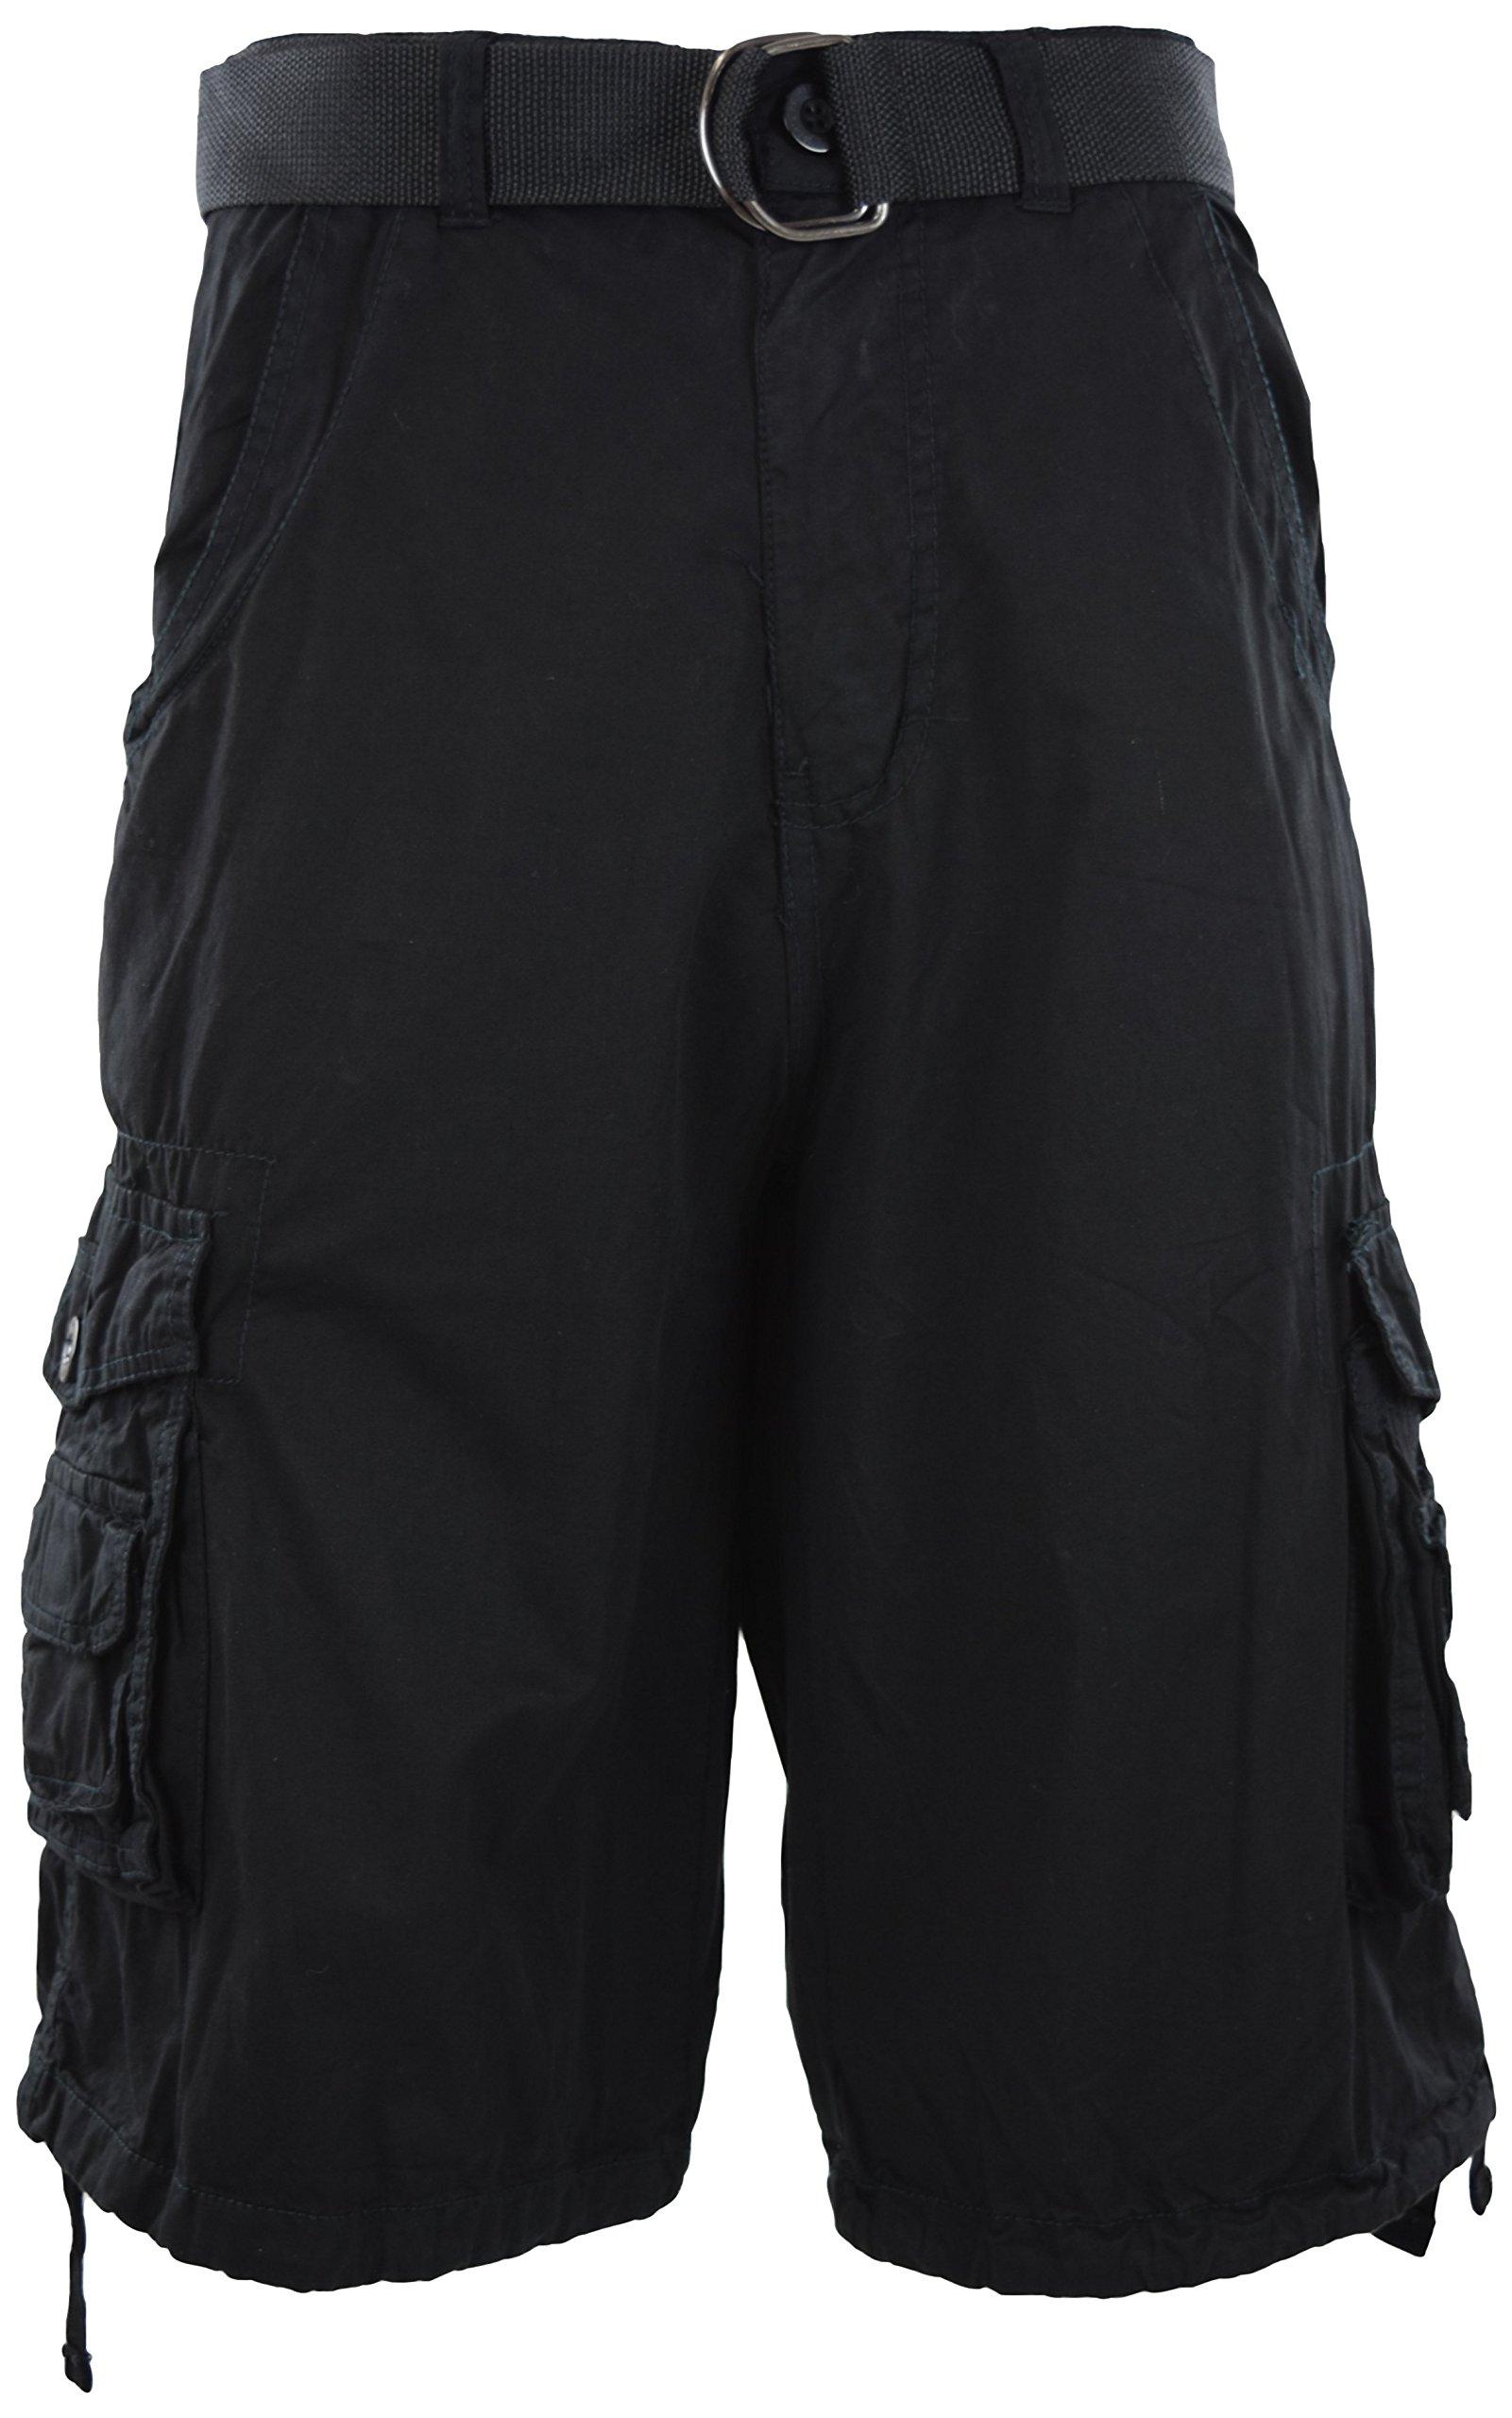 Mens Premium Cargo Shorts with Belt (8 Pockets 32-44 Size) (40, Black)